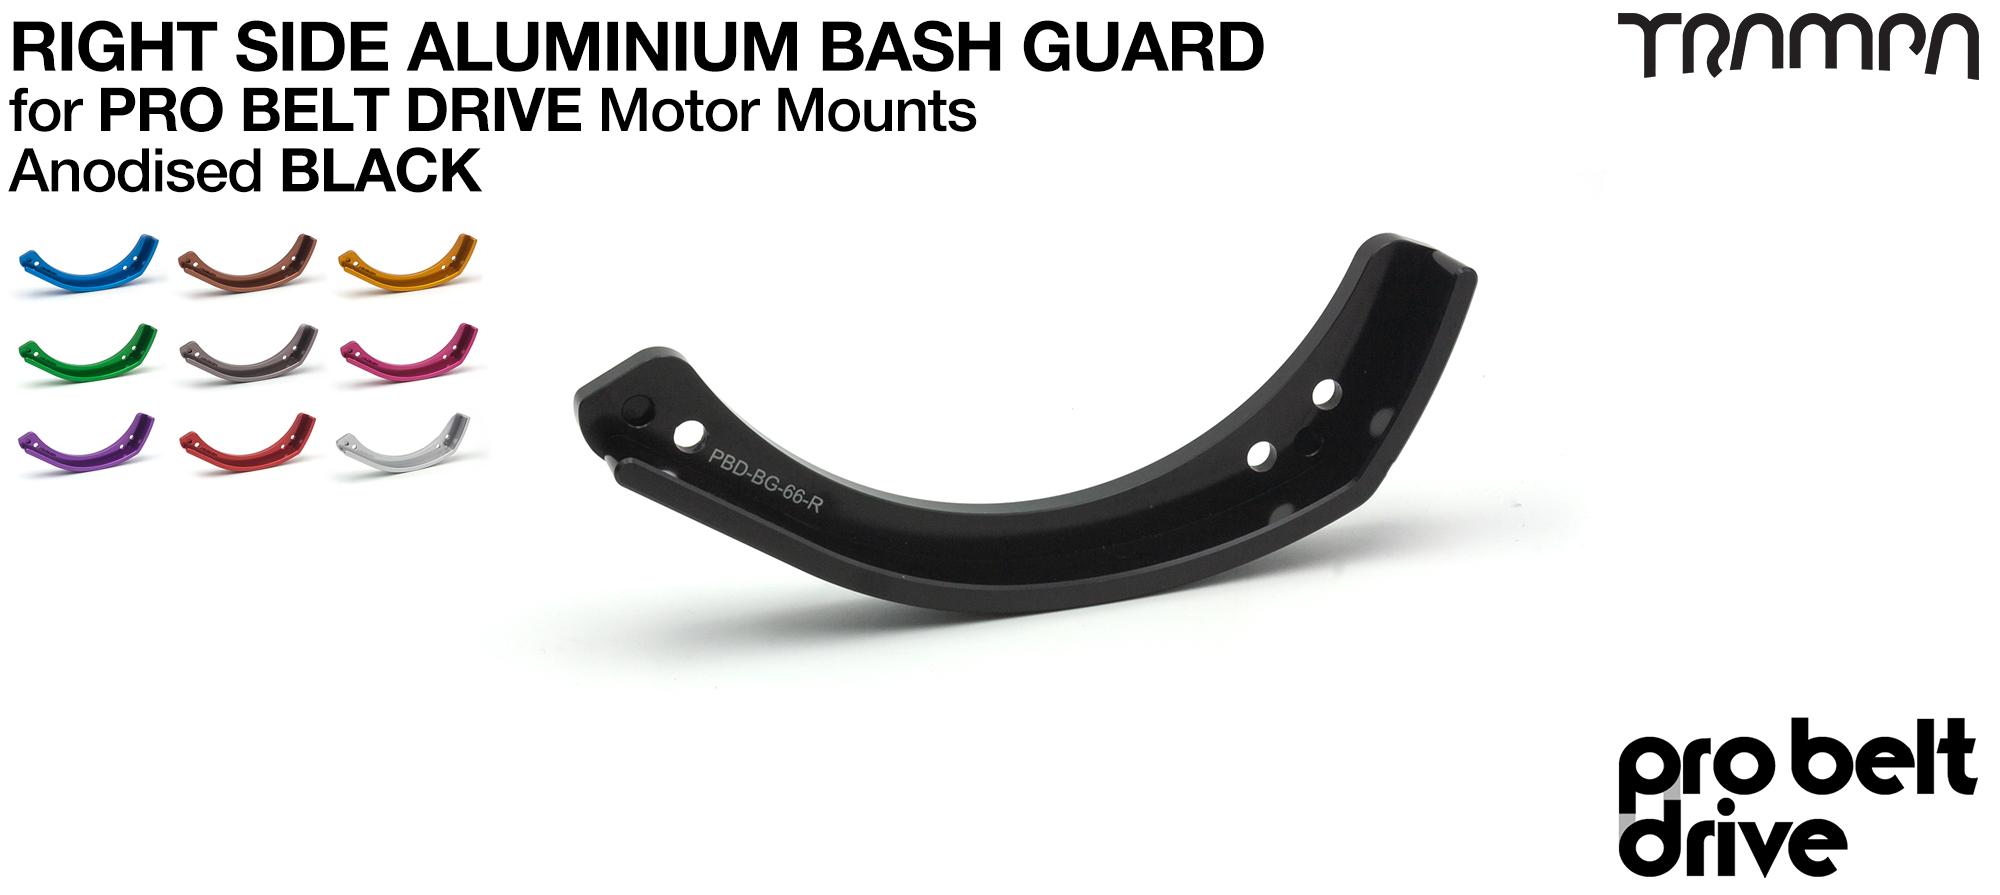 20mm PRO Belt Motor Mount Bash Guard - RIGHT (GOOFY)